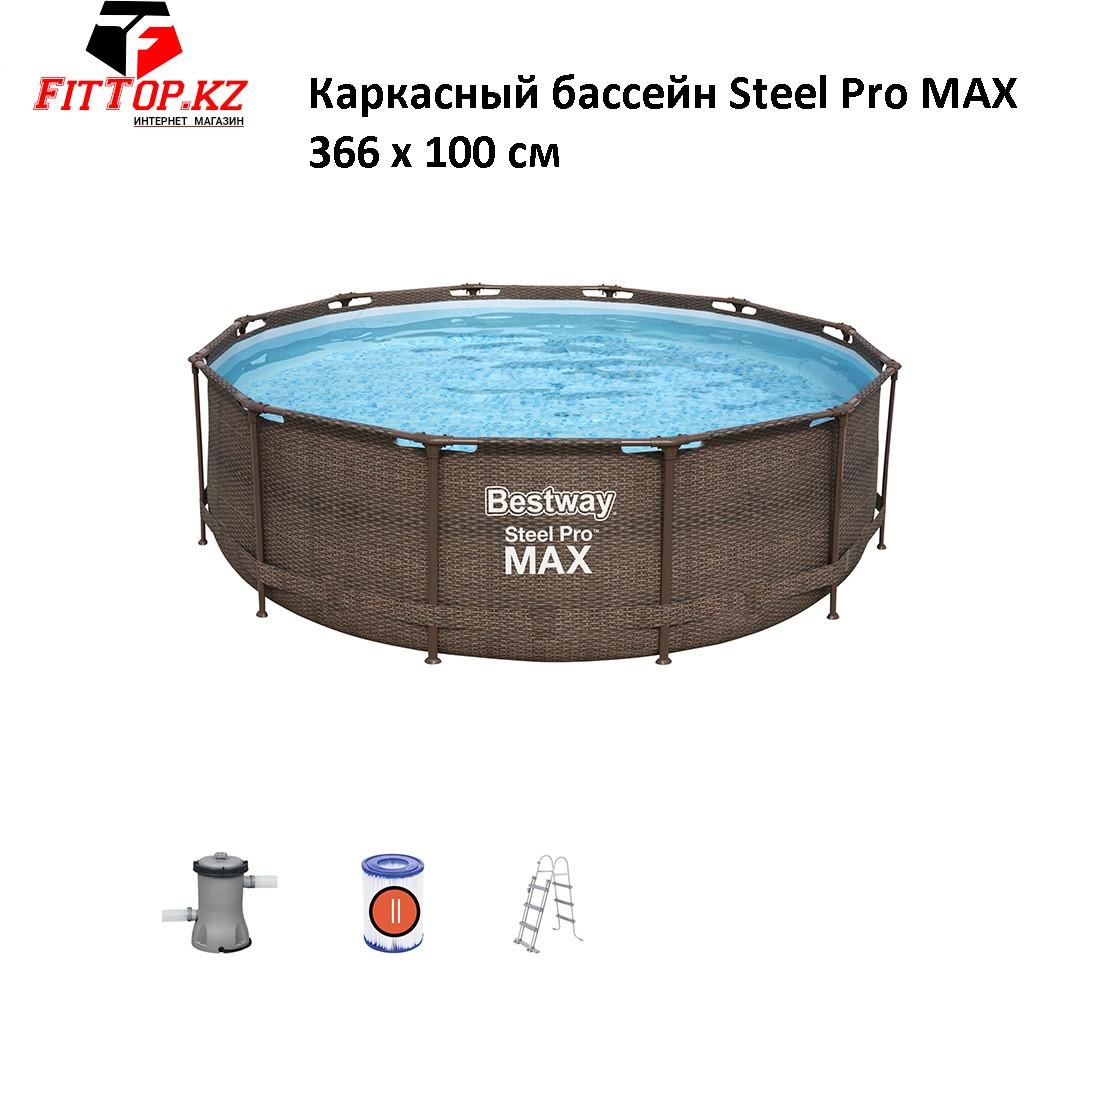 Каркасный бассейн Steel Pro MAX 366 х 100 см, BESTWAY, 56709, Винил, 9150 л